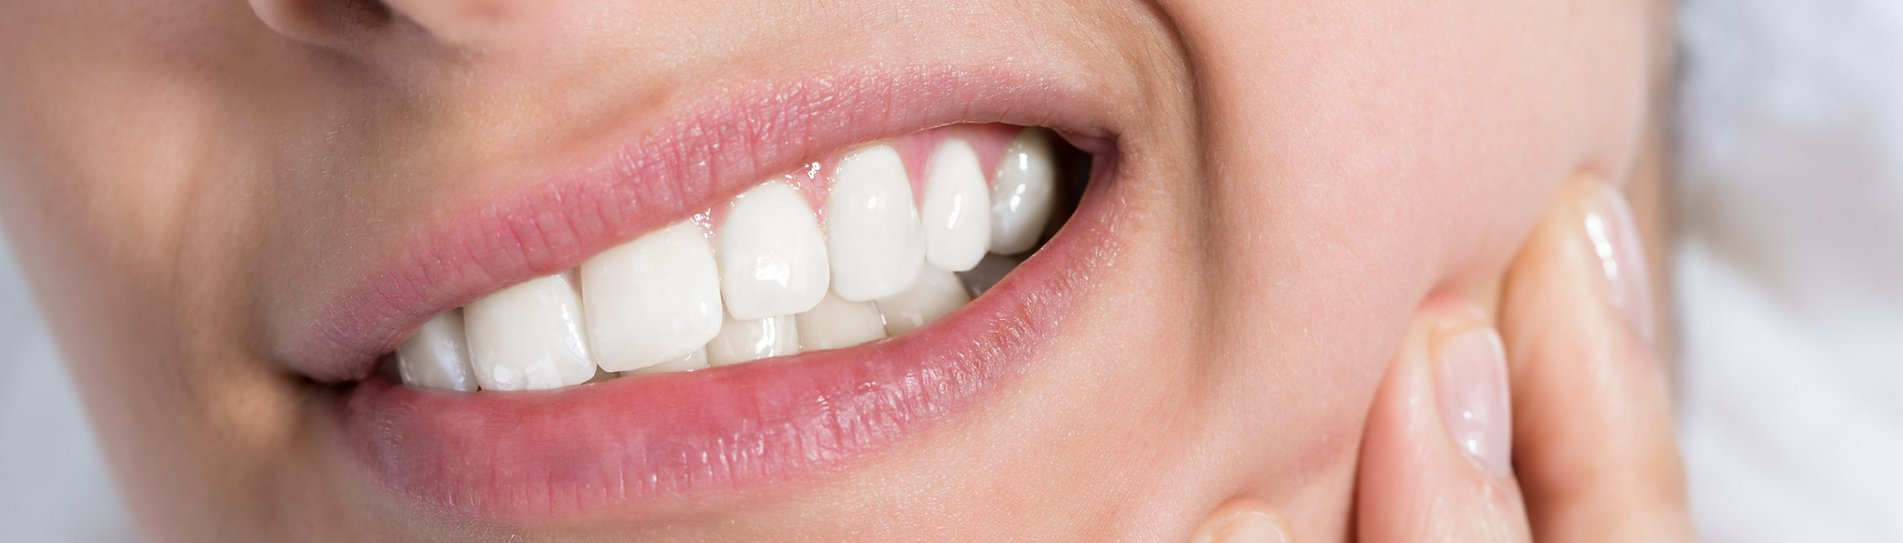 Night guard, teeth Grinding, Bruxism, Migrane, Stress, Camberwell Dentist